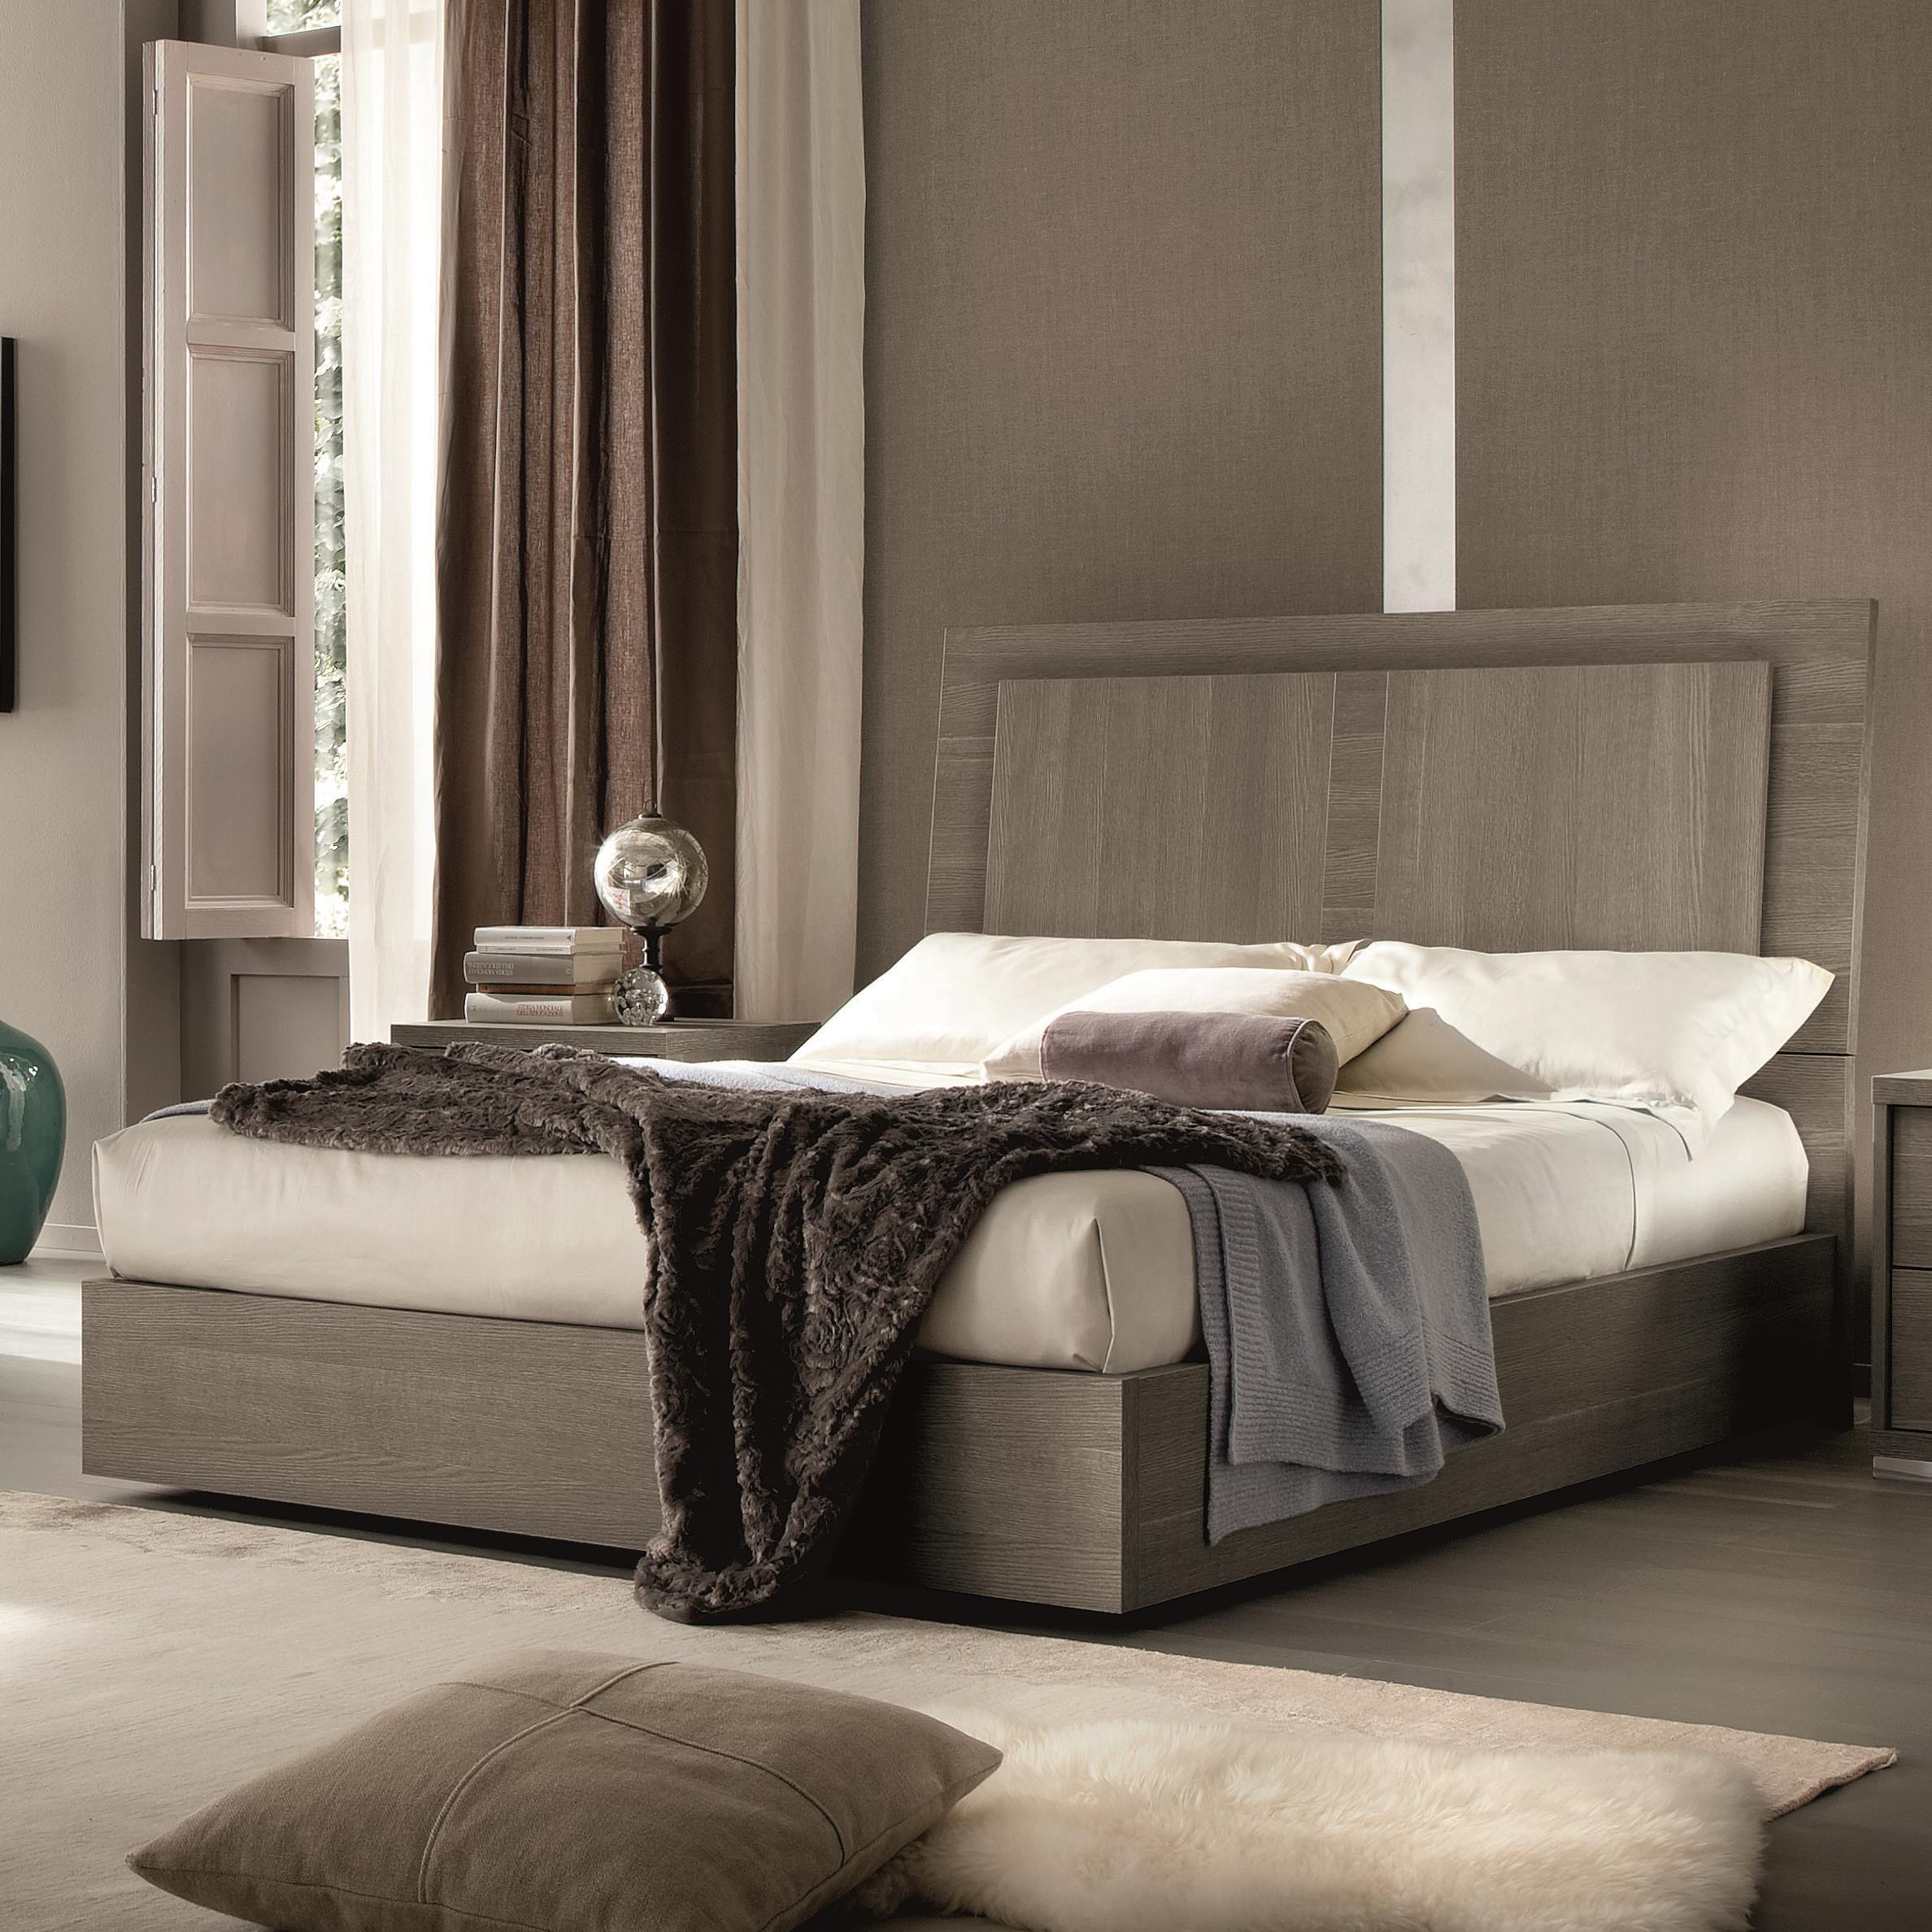 Tivoli Queen Bed by Alf Italia at Stoney Creek Furniture